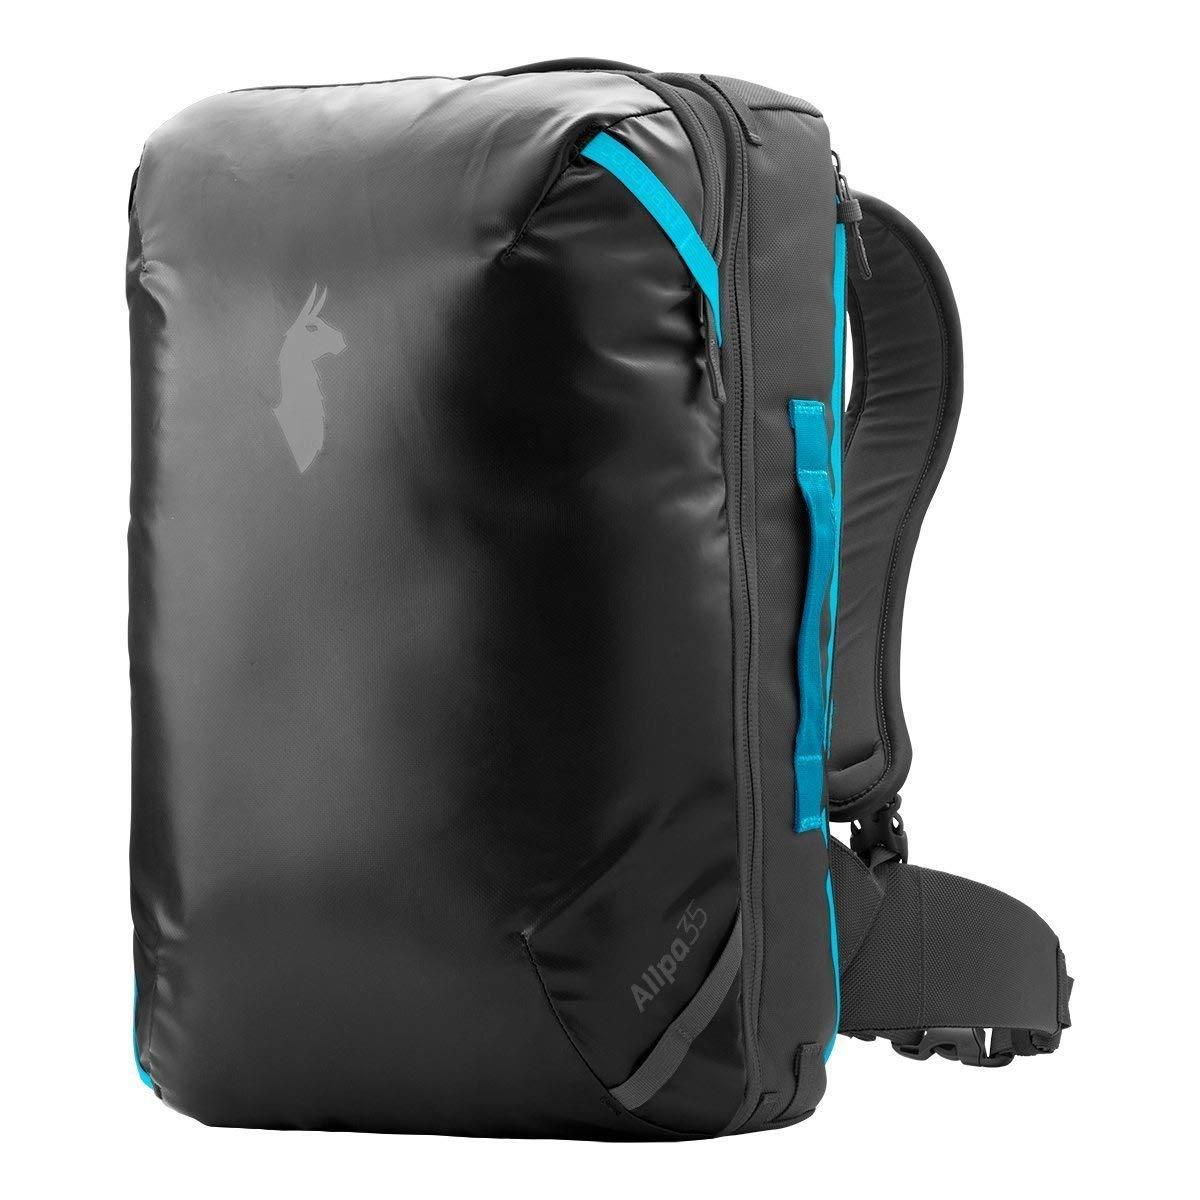 Cotopaxi Allpa 35L Travel Pack - Black/Blue 35L